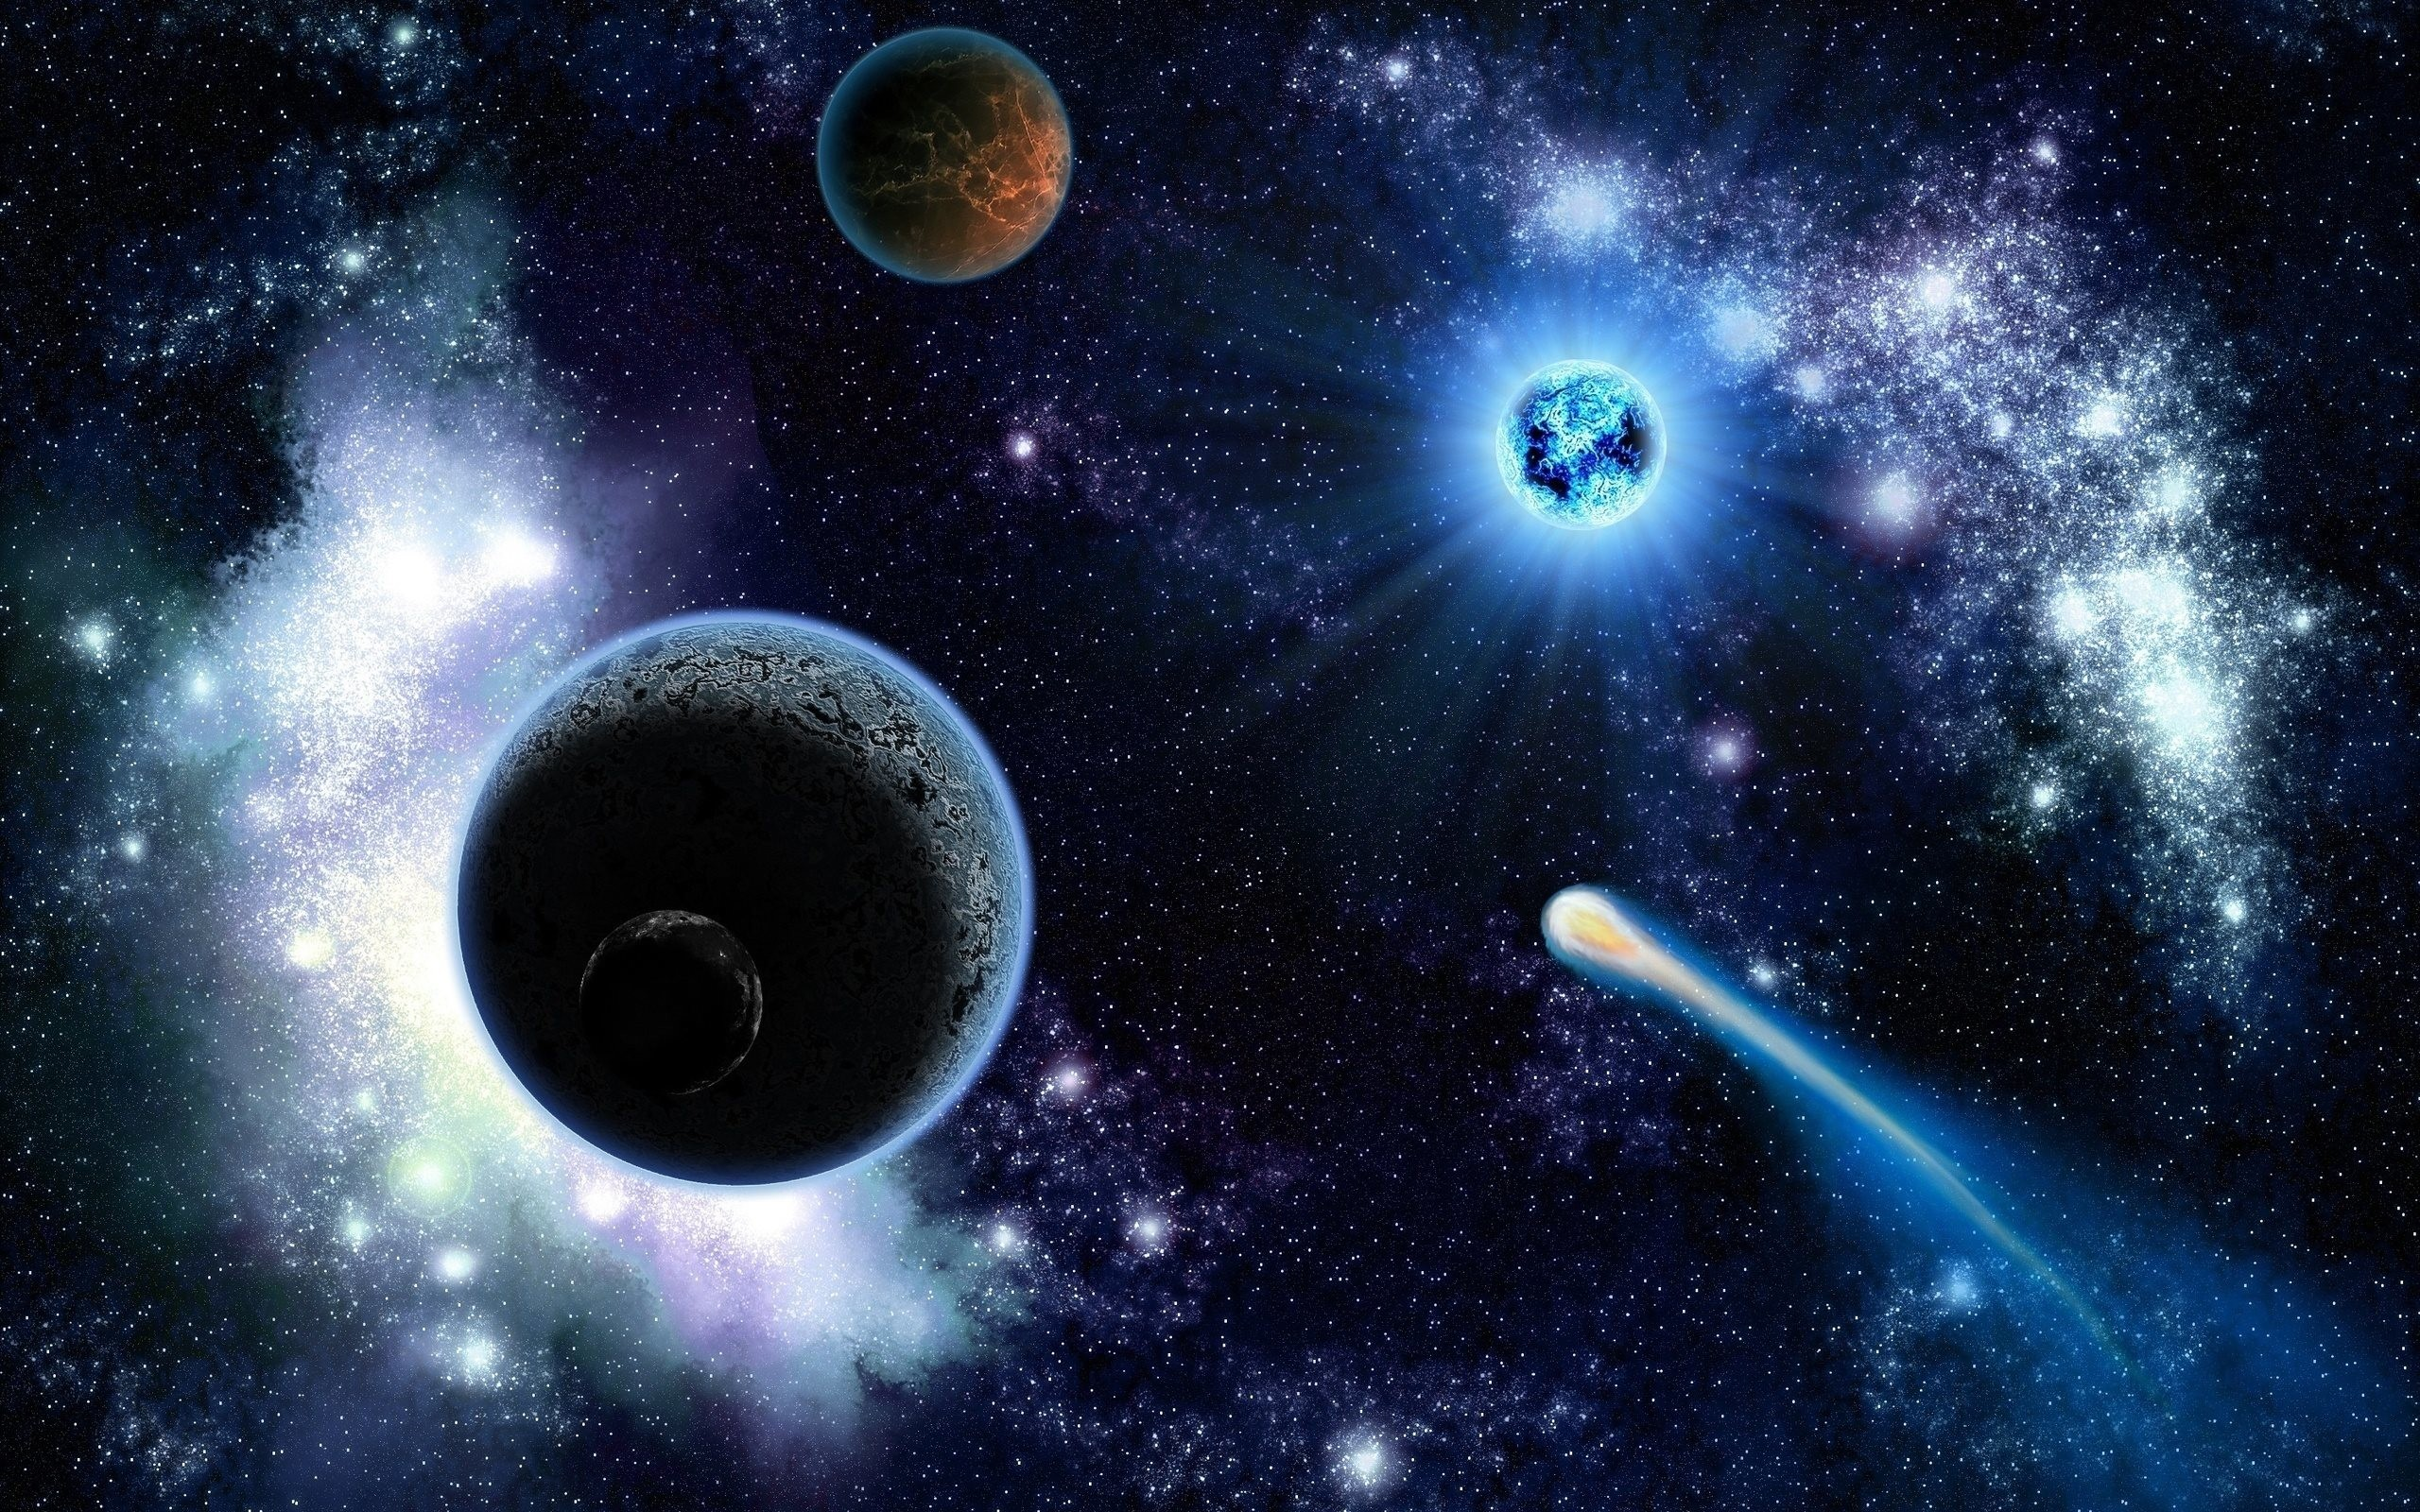 Sfondi pianeti 68 immagini for Sfondi galassie hd